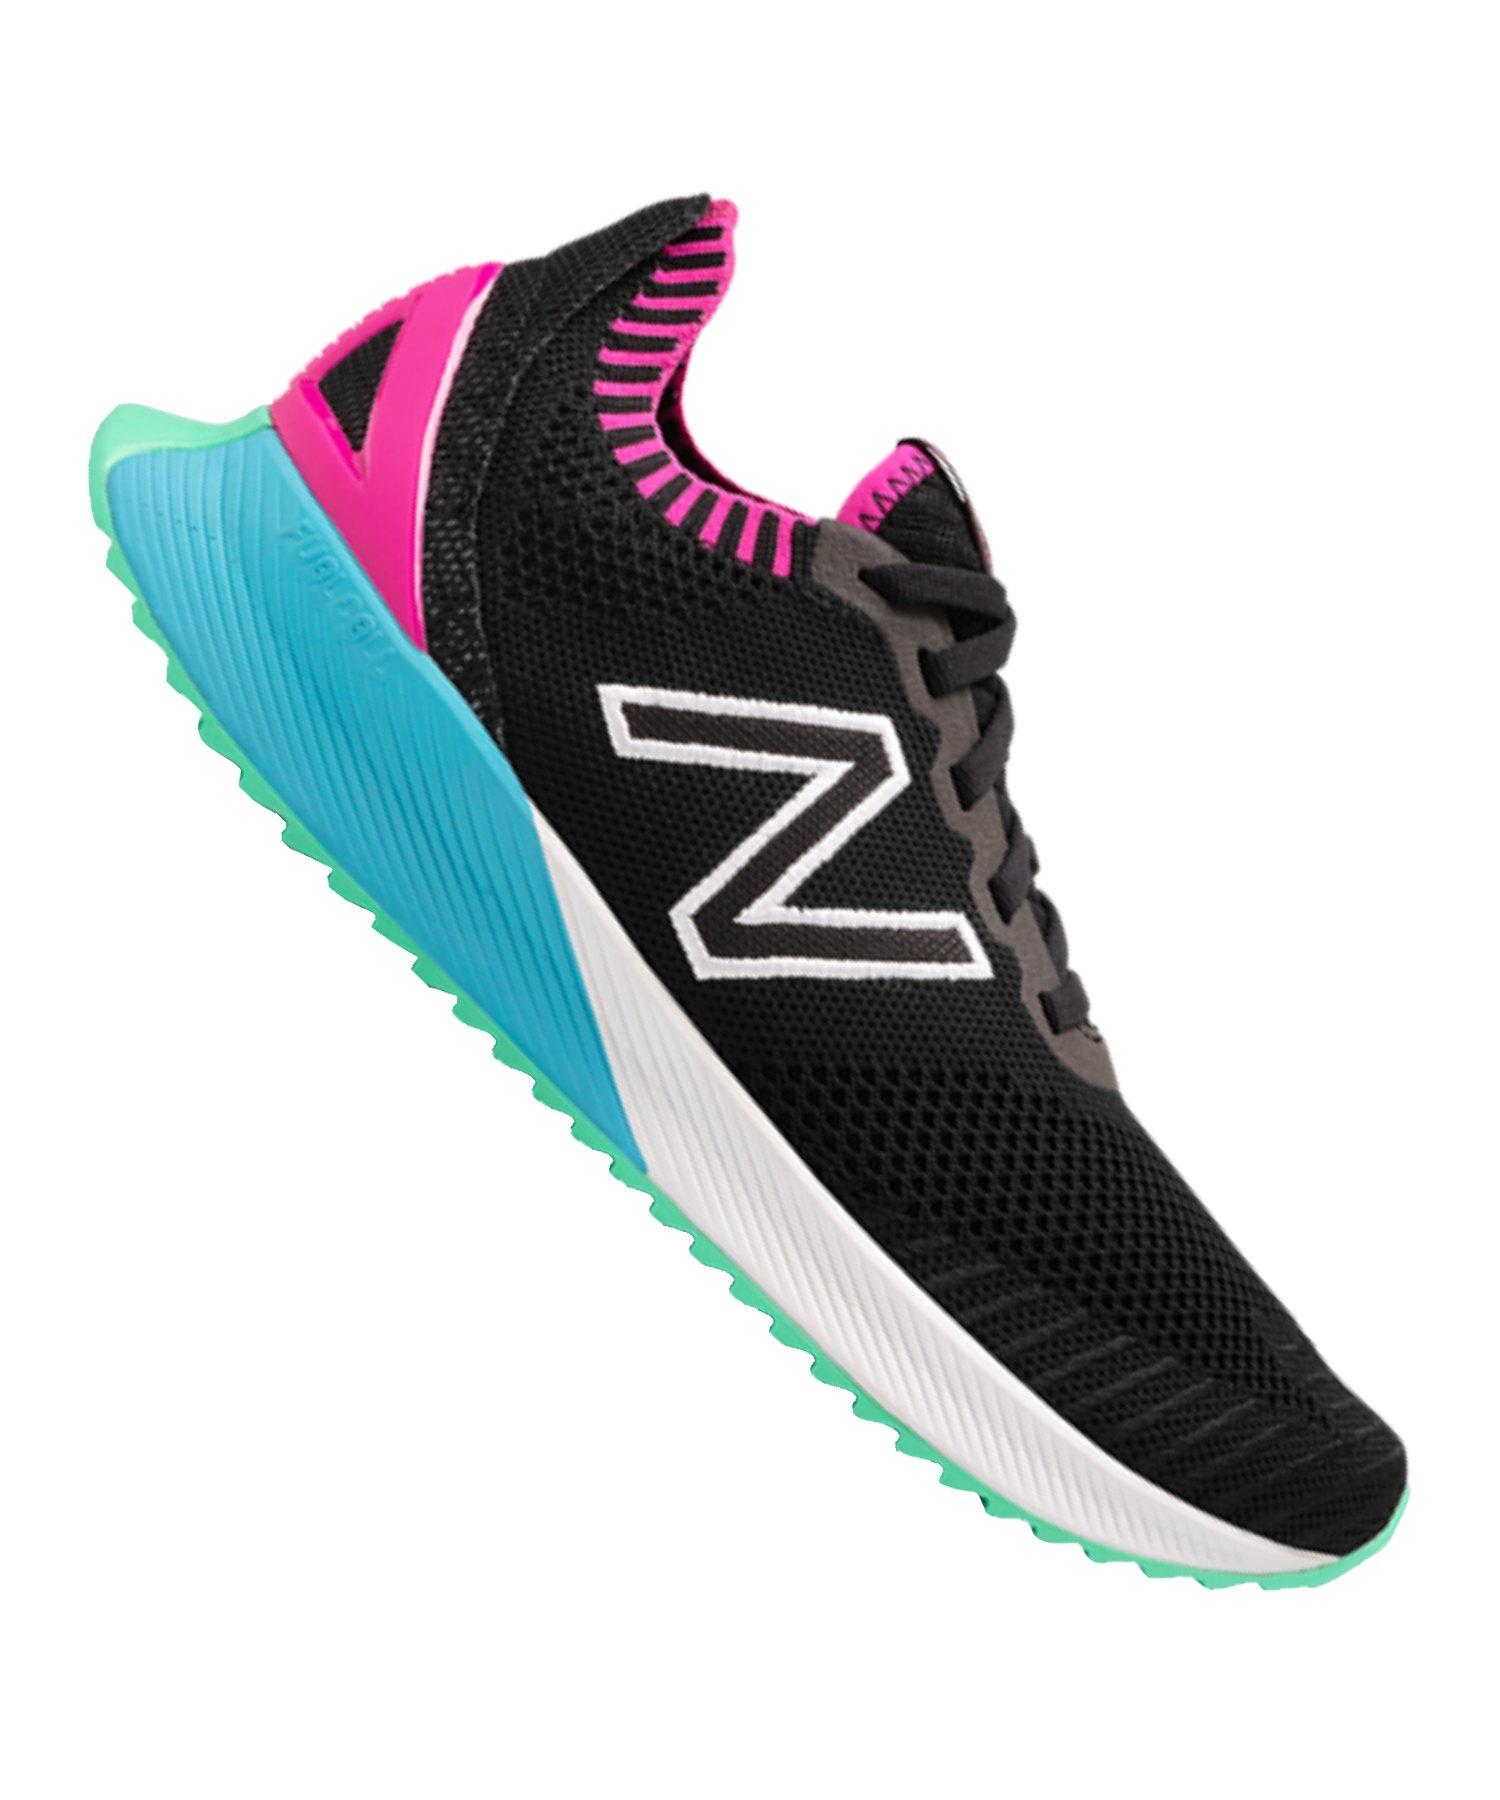 new balance 574 elite edition, New Balance Laufschuh Neutral